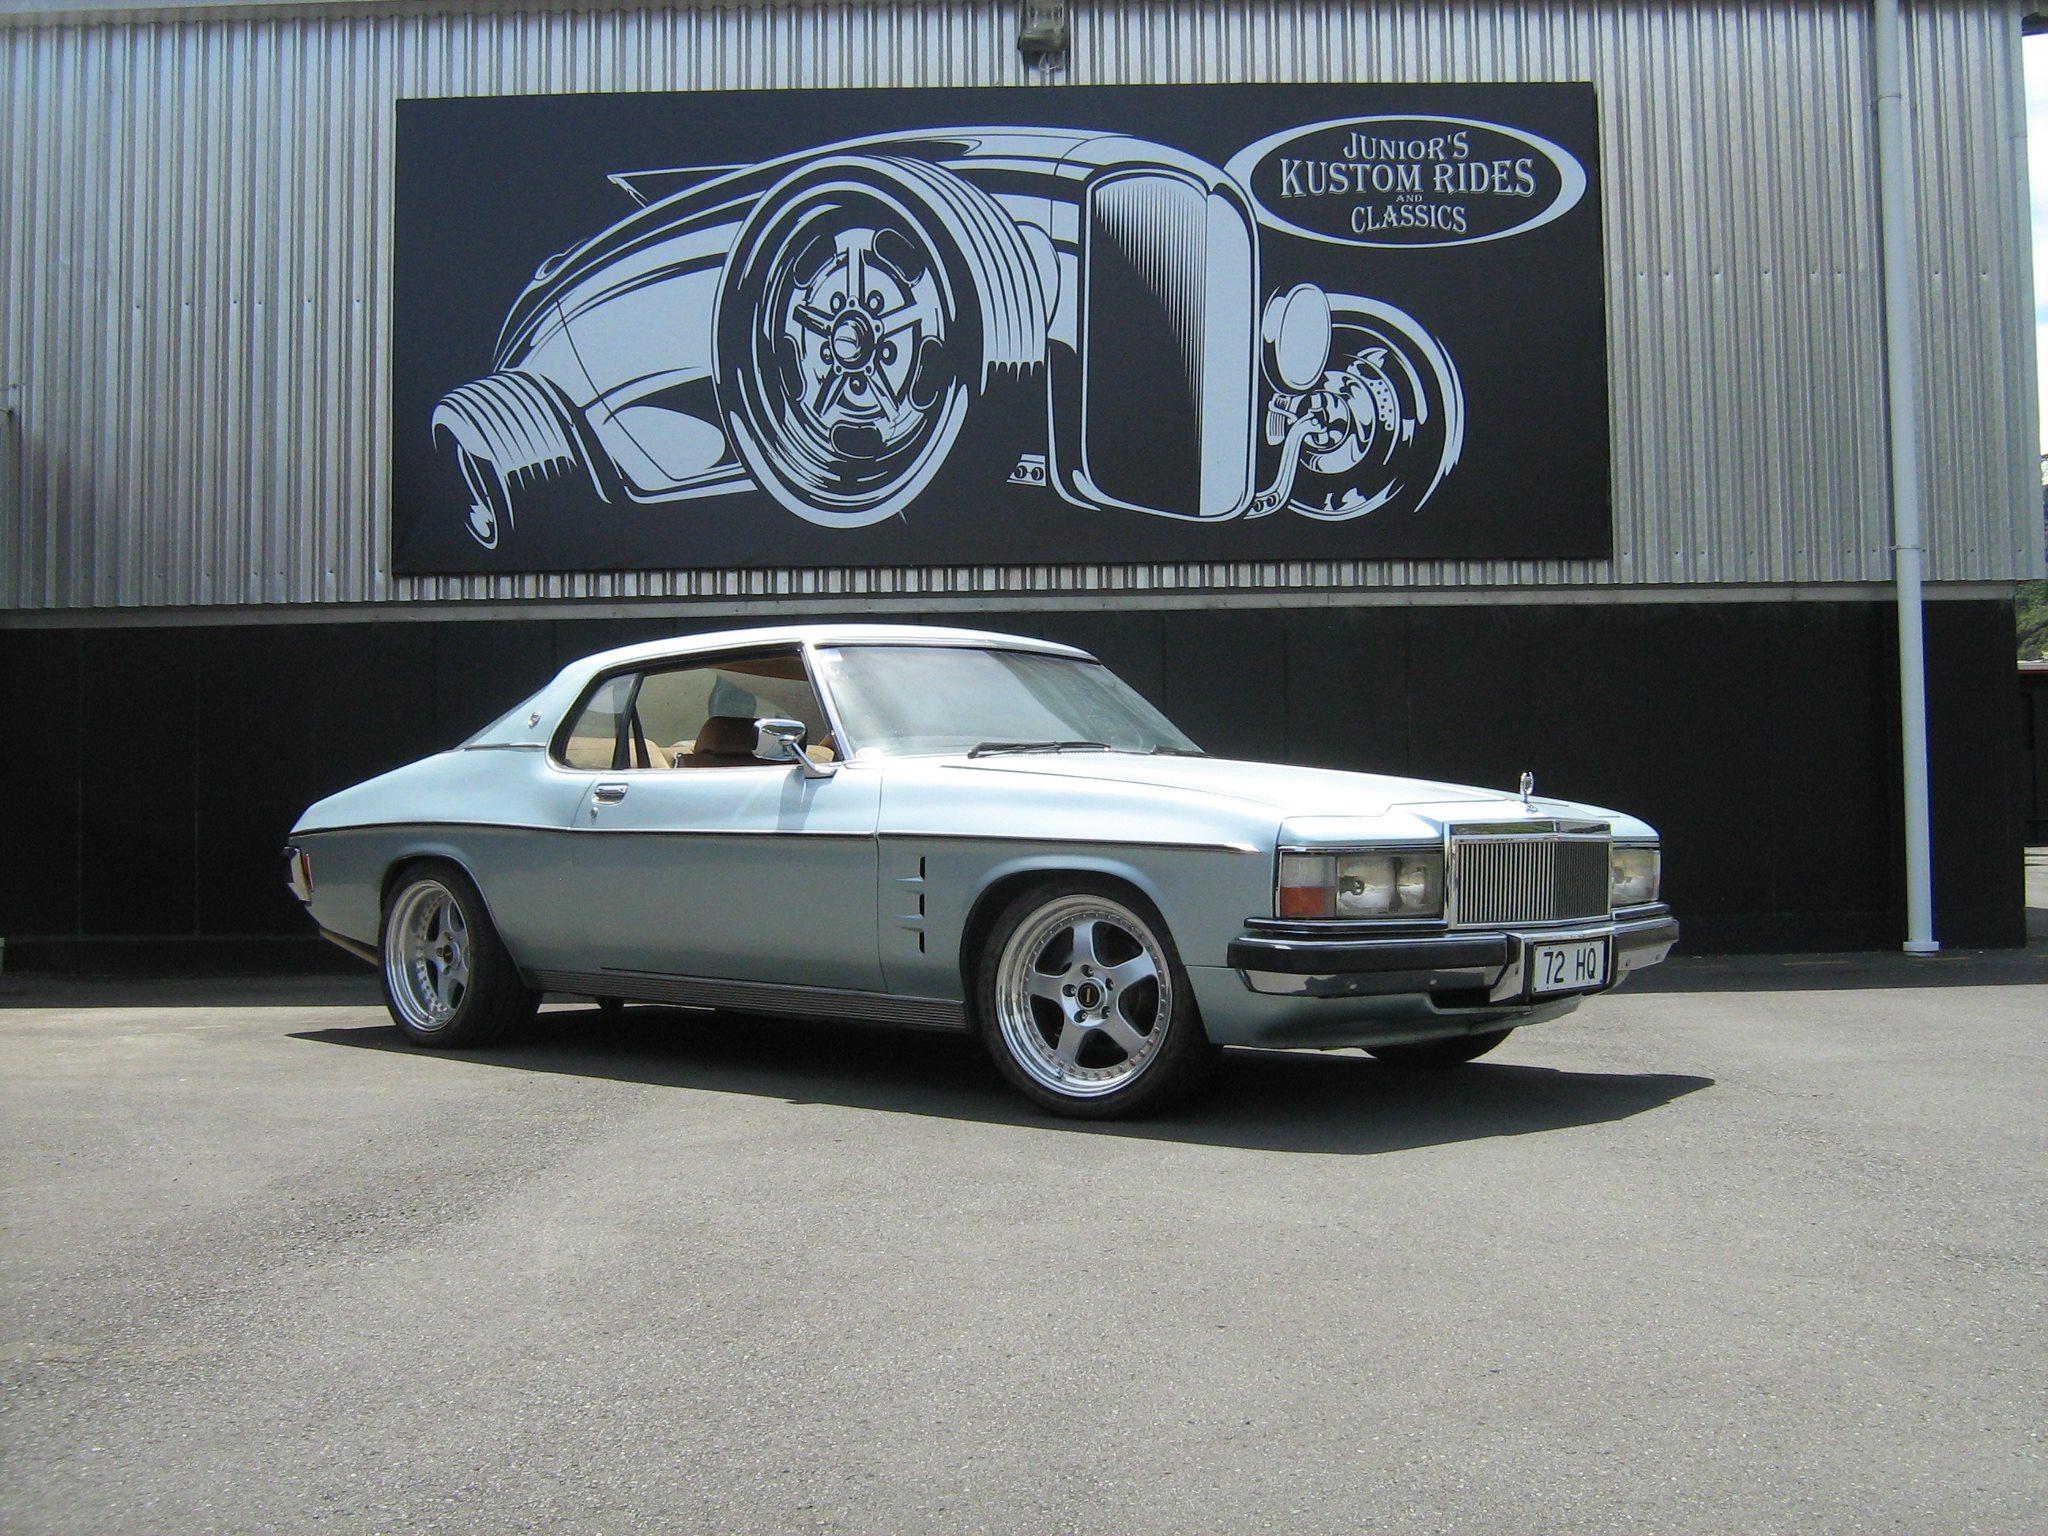 My '72 Holden Monaro